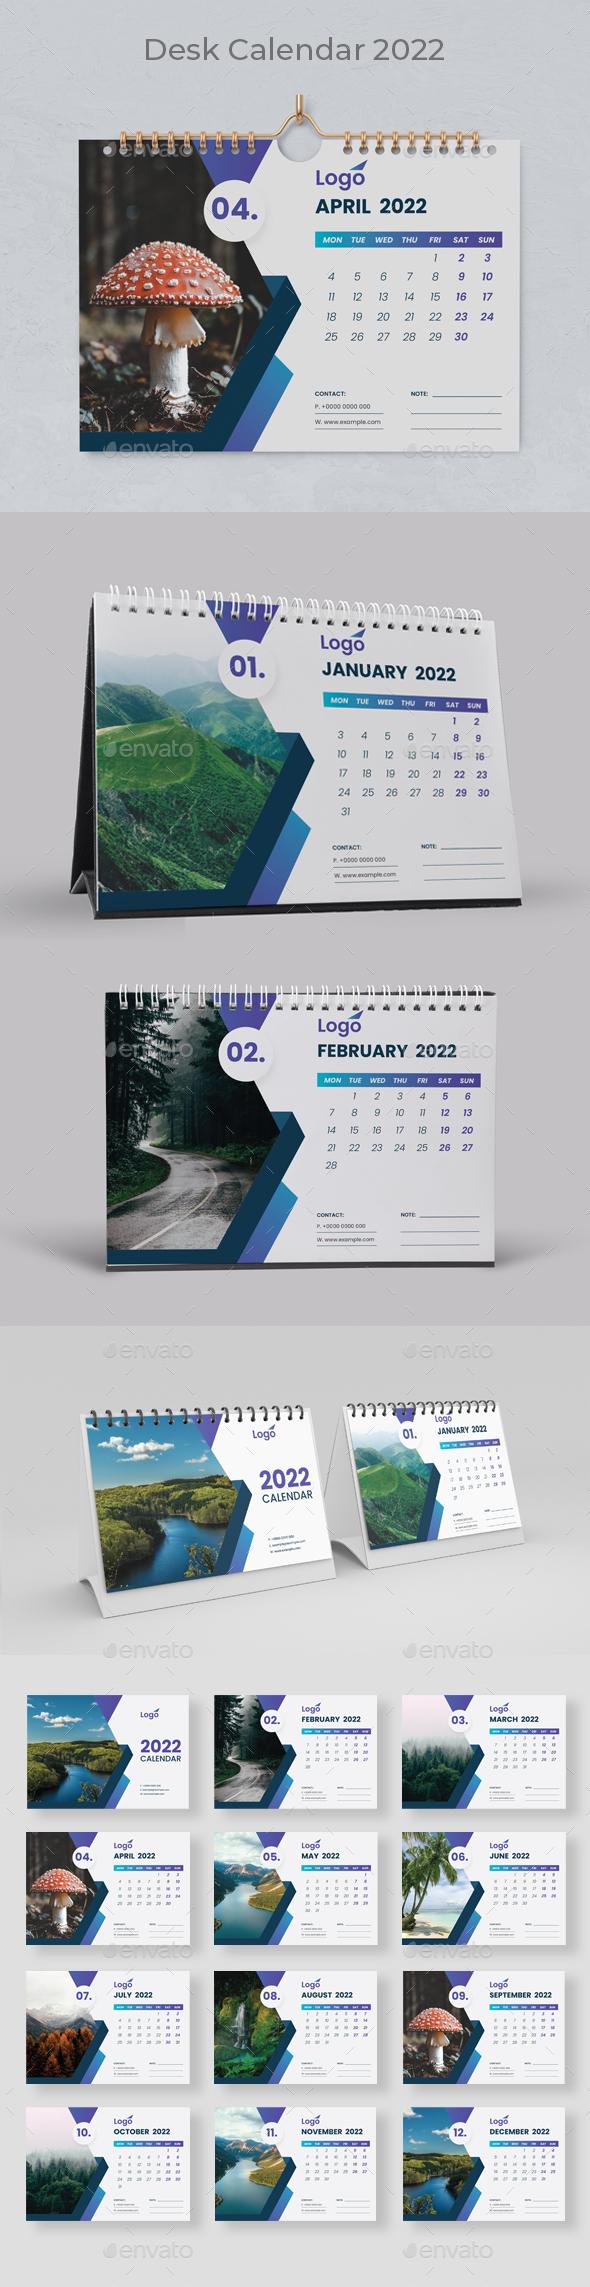 Blue Desk Calendar 2022